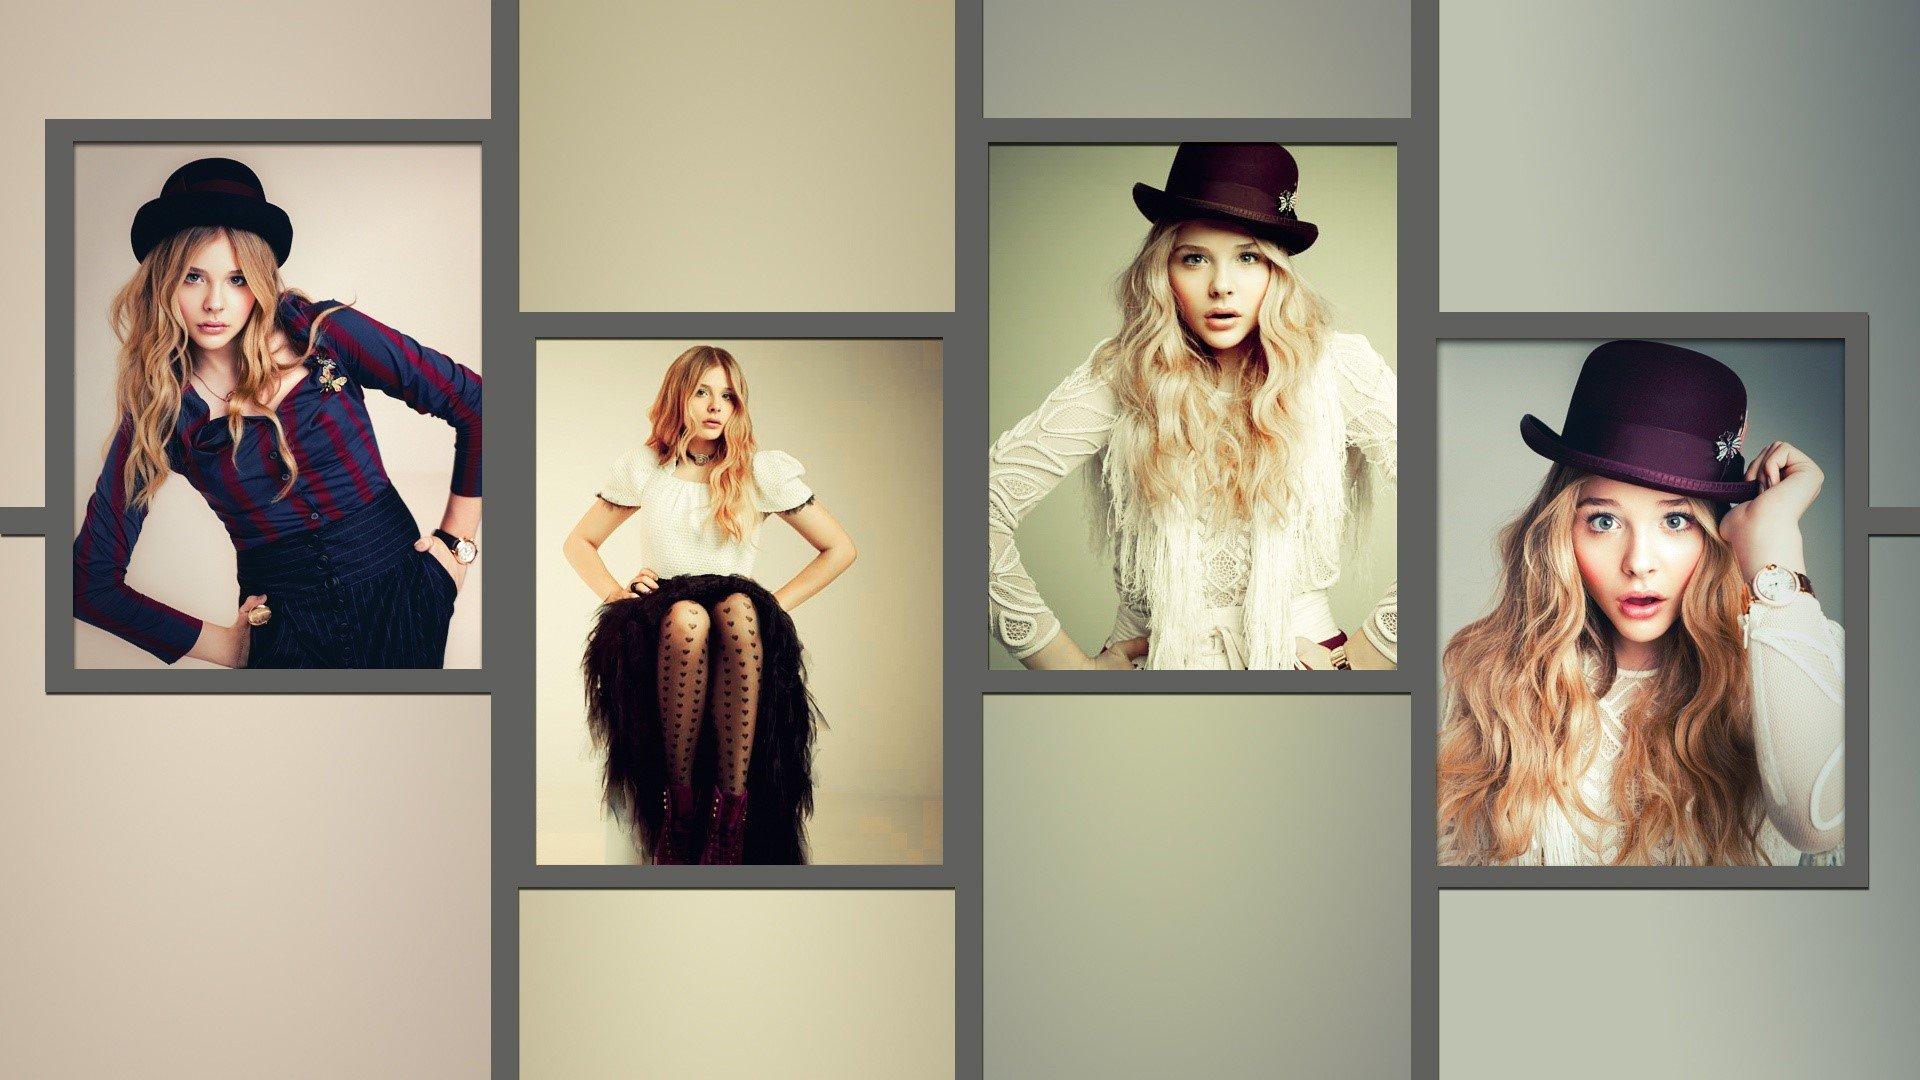 Fondos de pantalla Chloe Moretz Collage